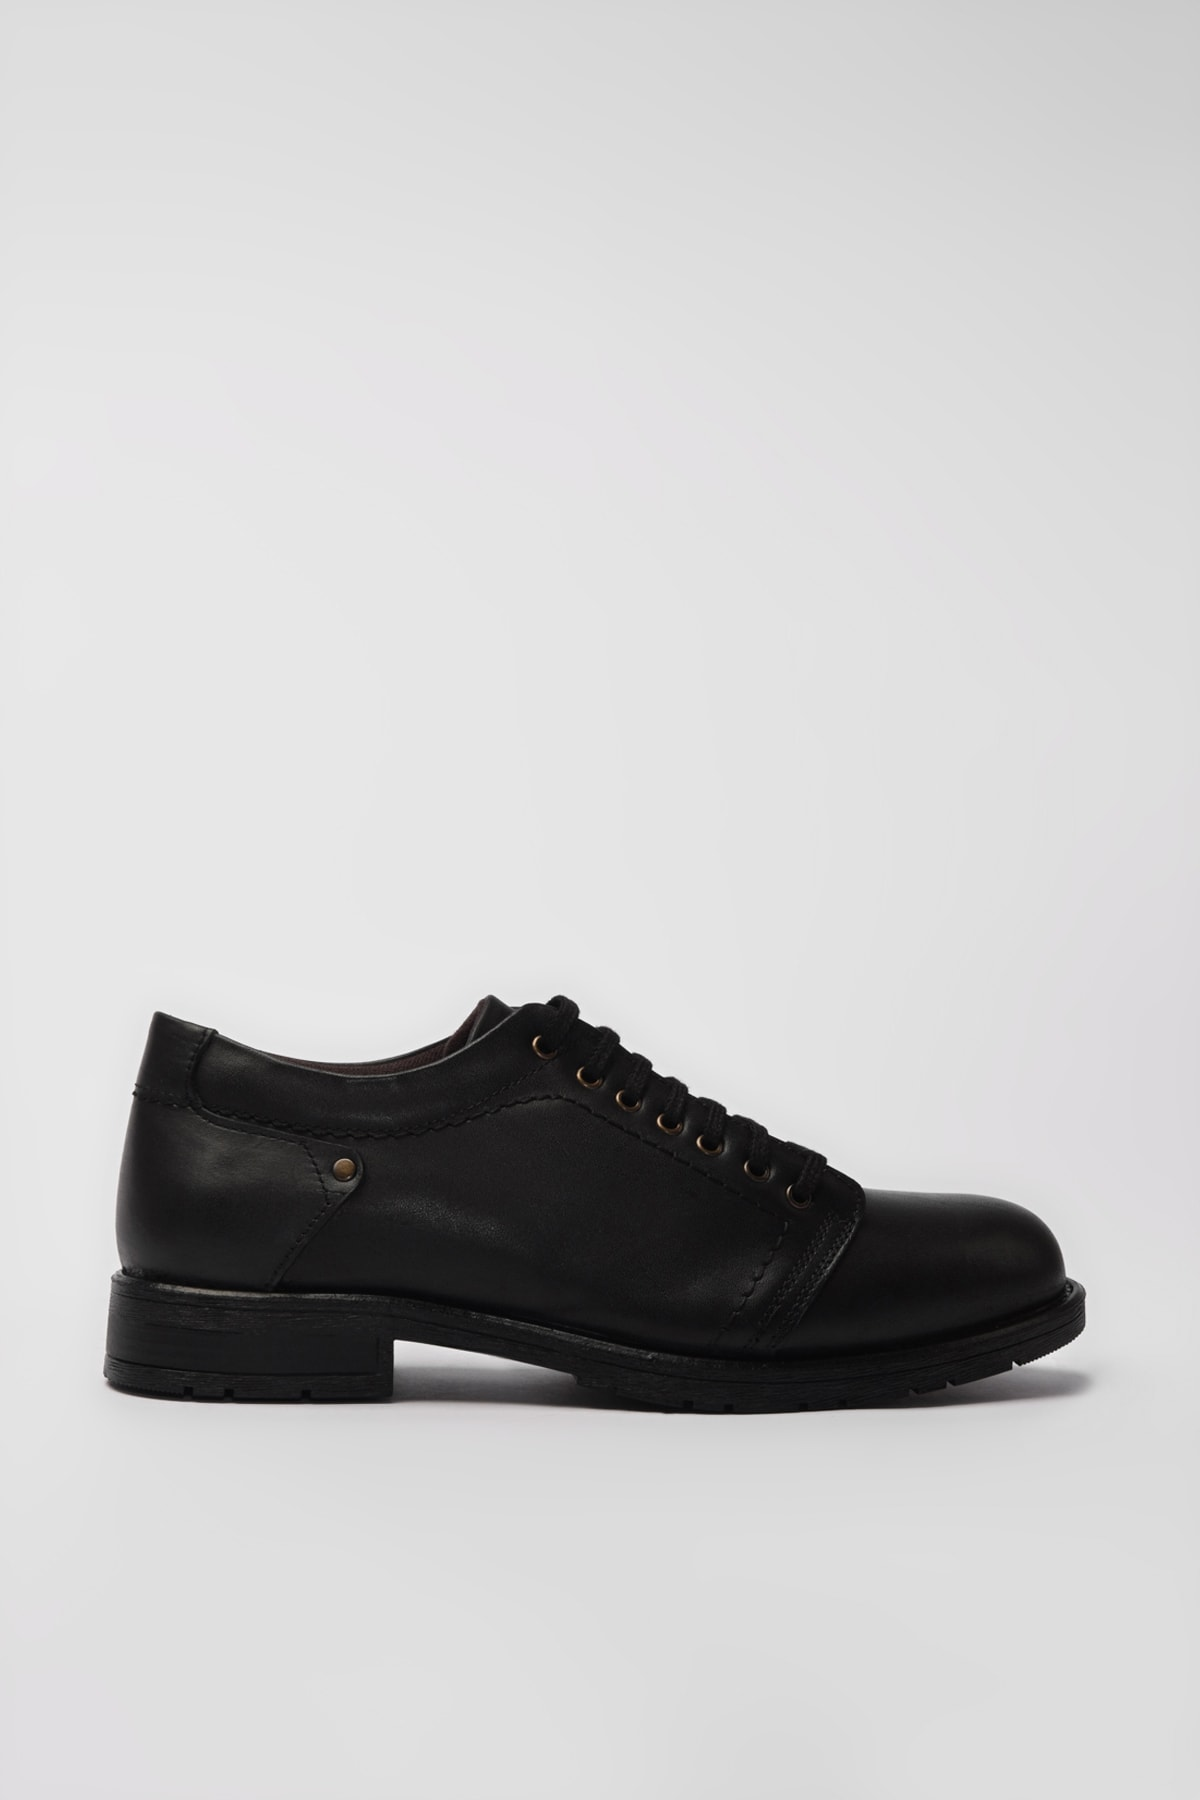 Yaya  by Hotiç Hakiki Deri Siyah Erkek Casual Ayakkabı 02AYY194960A100 1